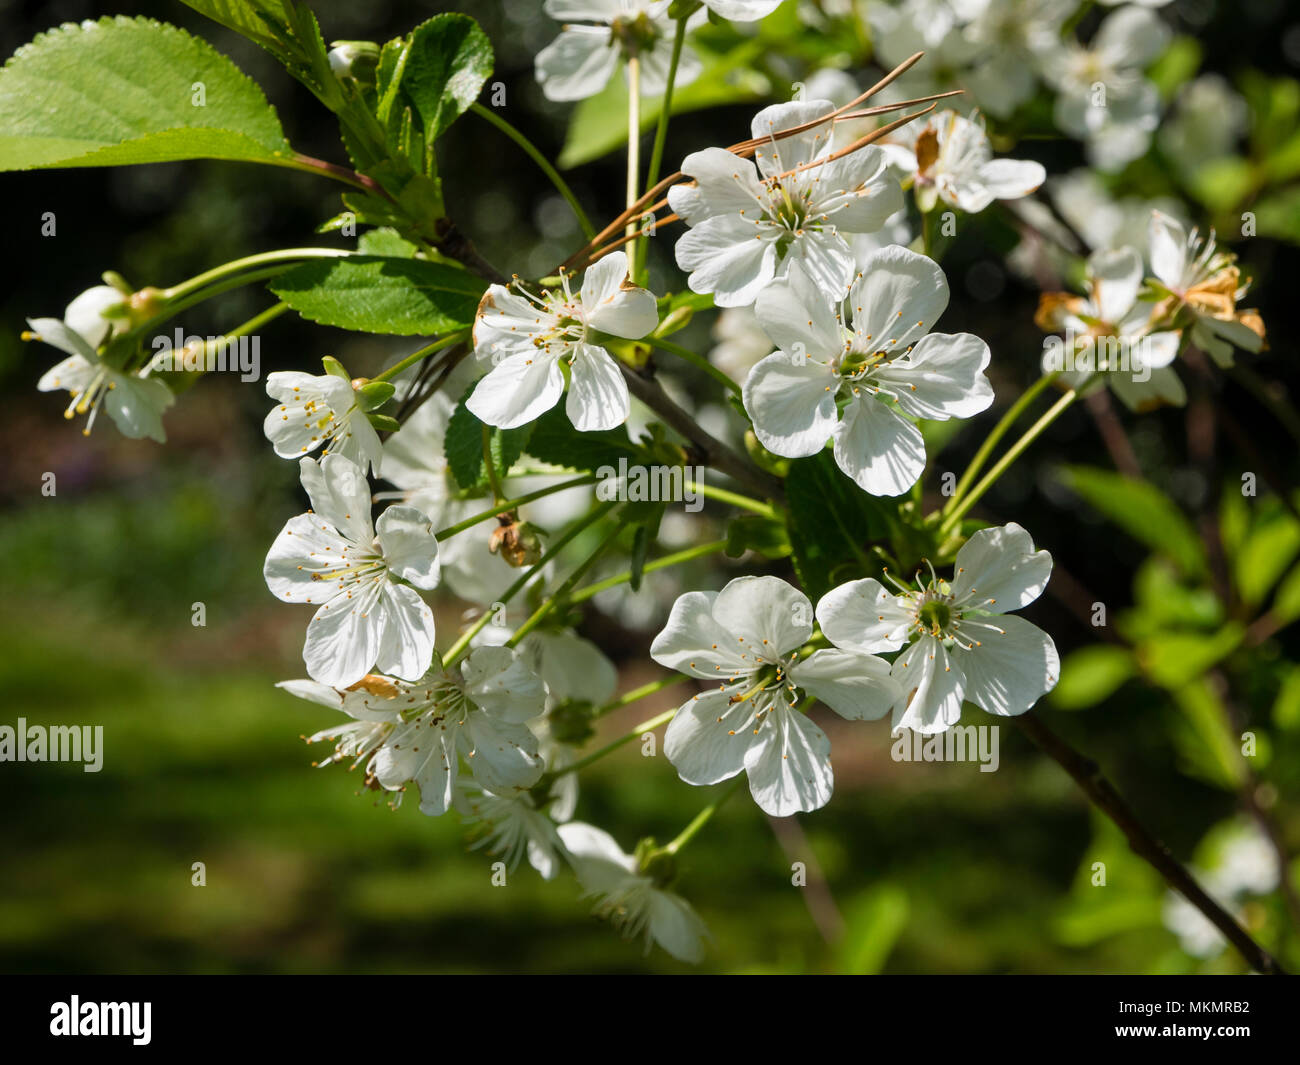 Fiori Bianchi Primaverili.I Fiori Bianchi Primaverili Di Hardy Marasca Prunus Cerasus